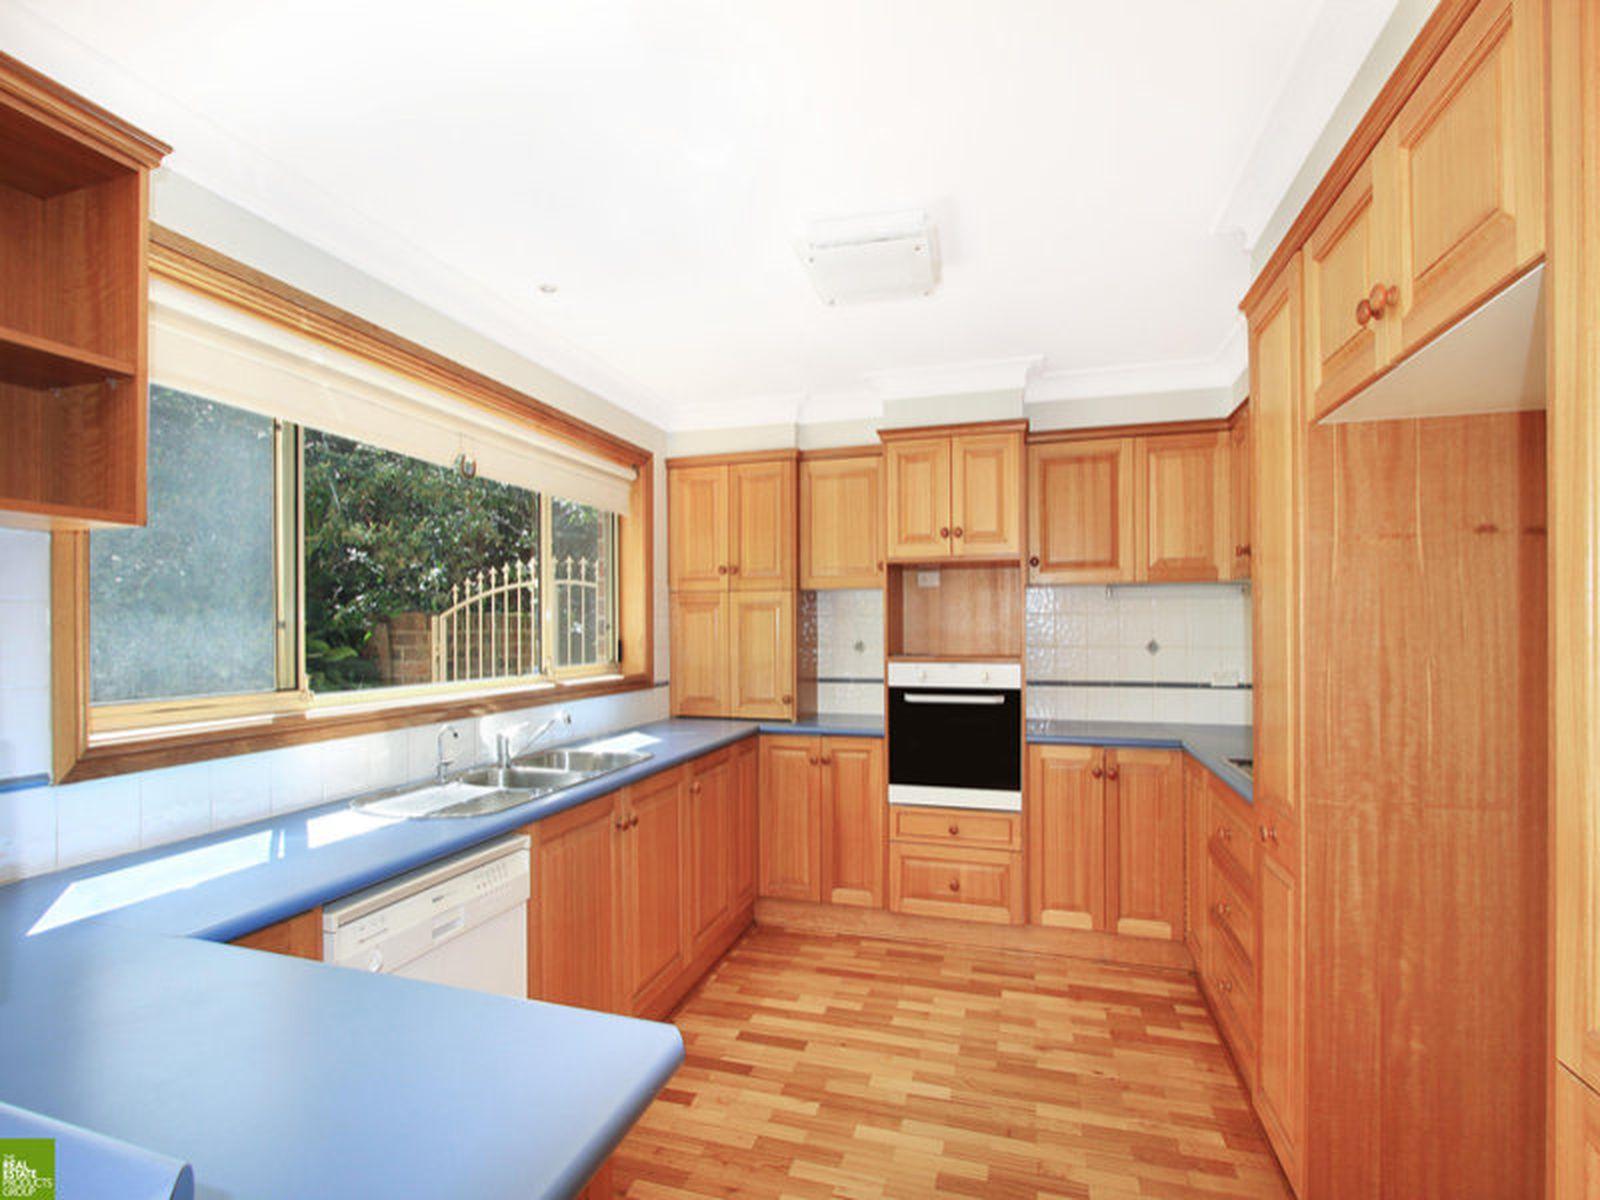 5 / 36 Gipps Street, North Wollongong